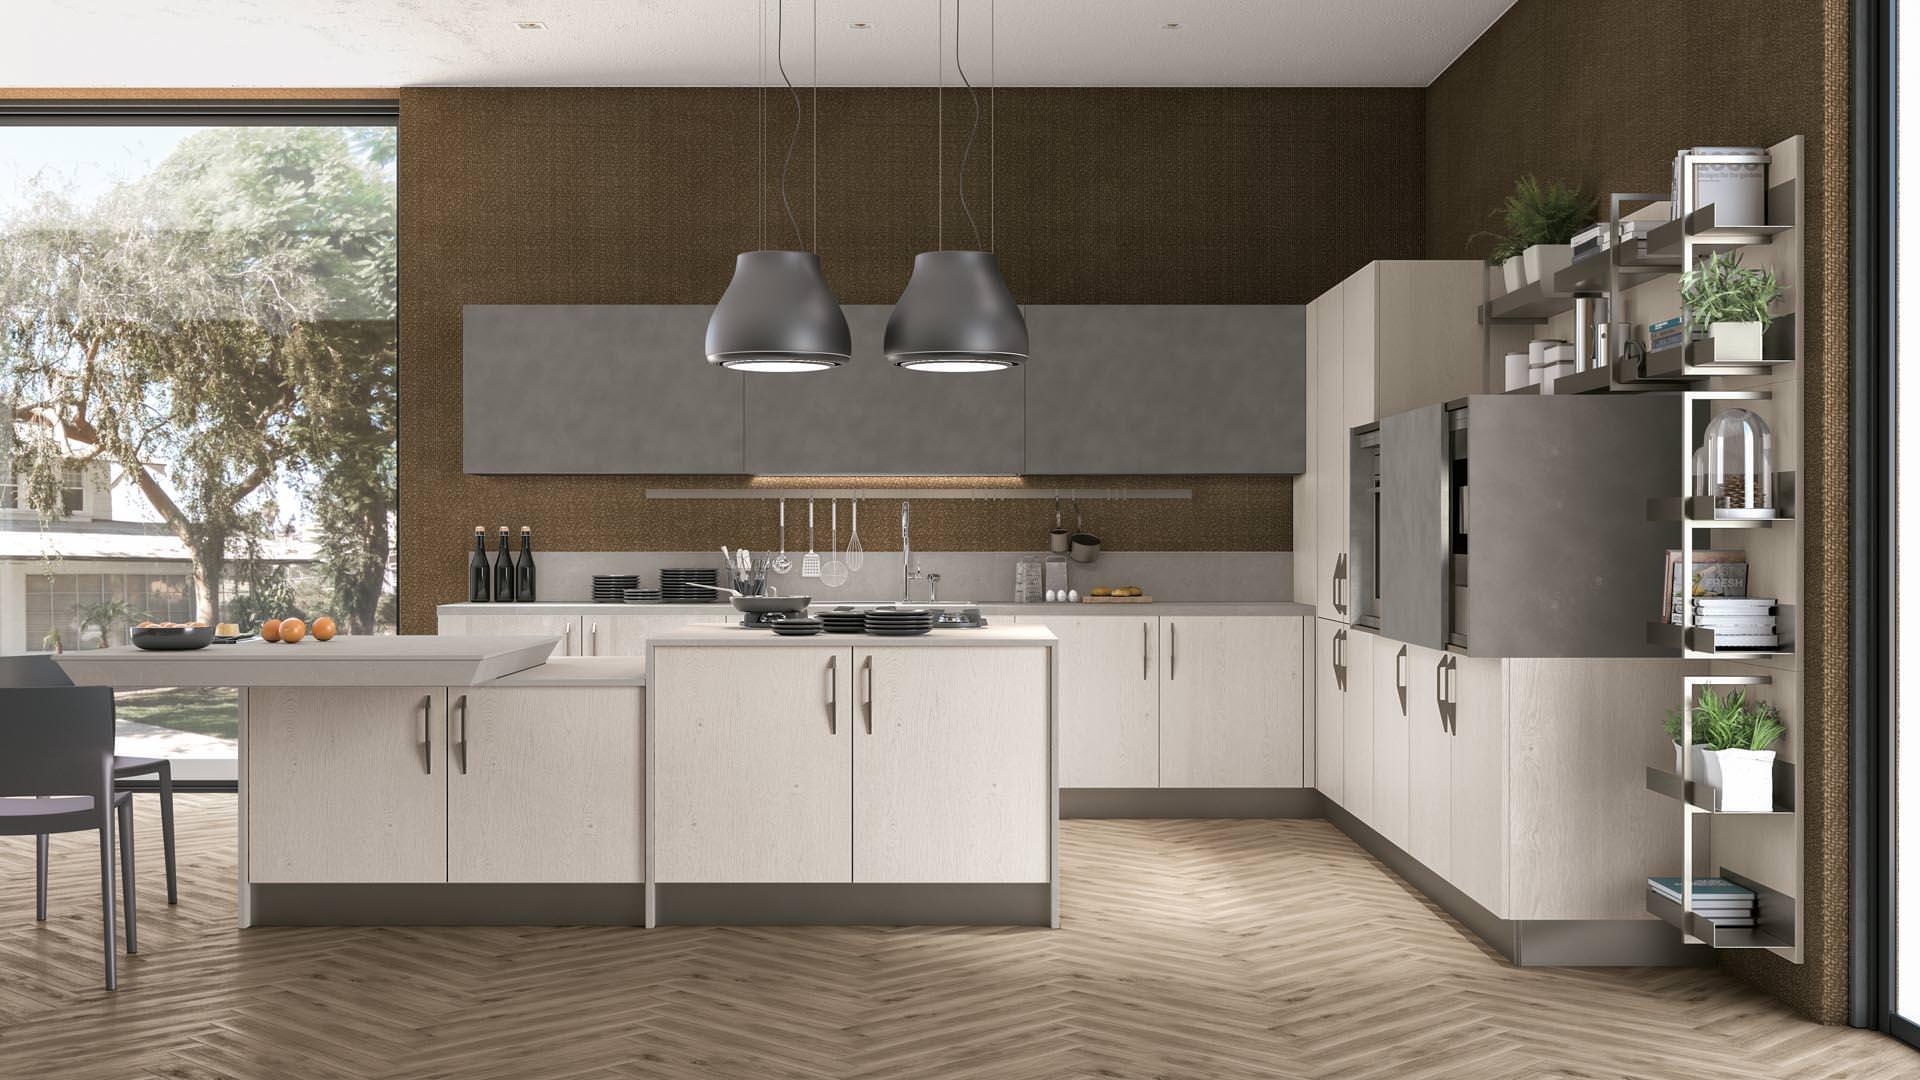 Emejing lube cucine moderne ideas ideas design 2017 - Cucine 2017 moderne ...